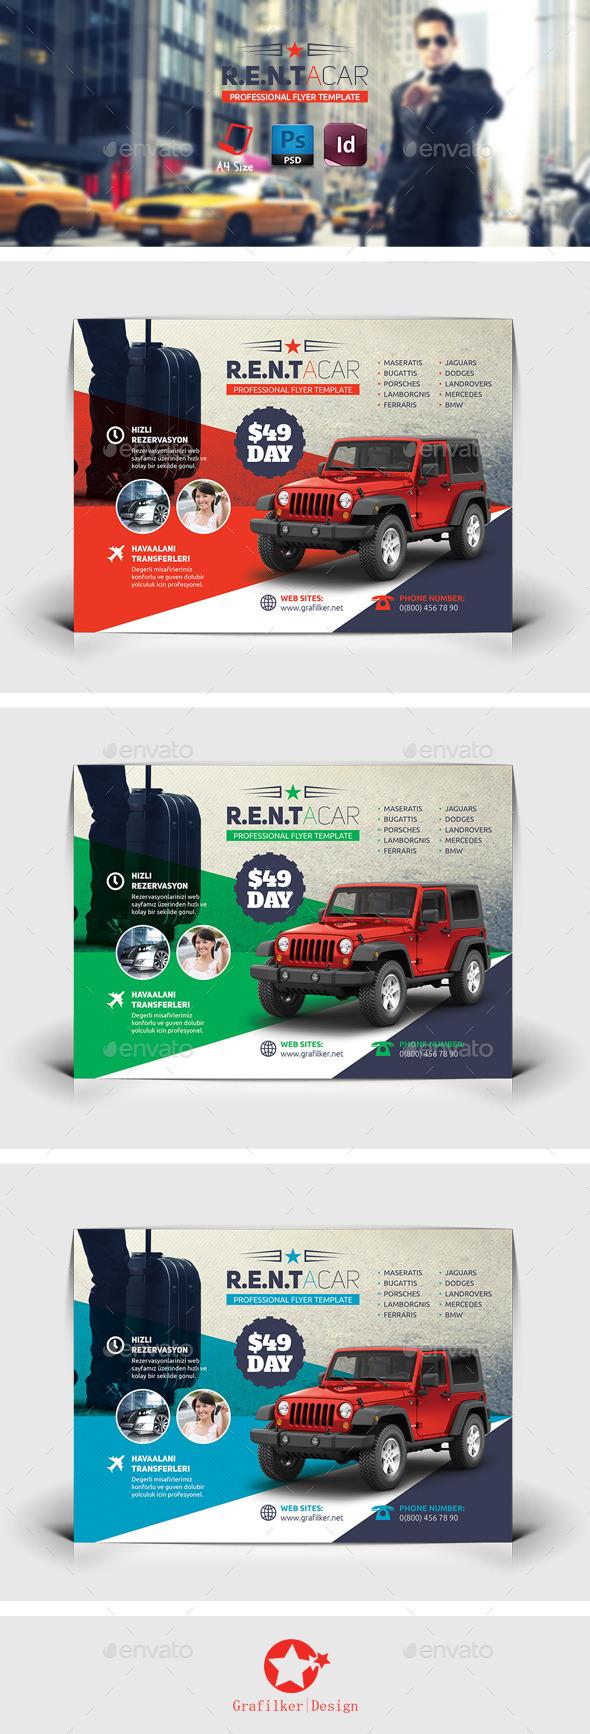 GraphicRiver Rent A Car Flyer Templates 8838464